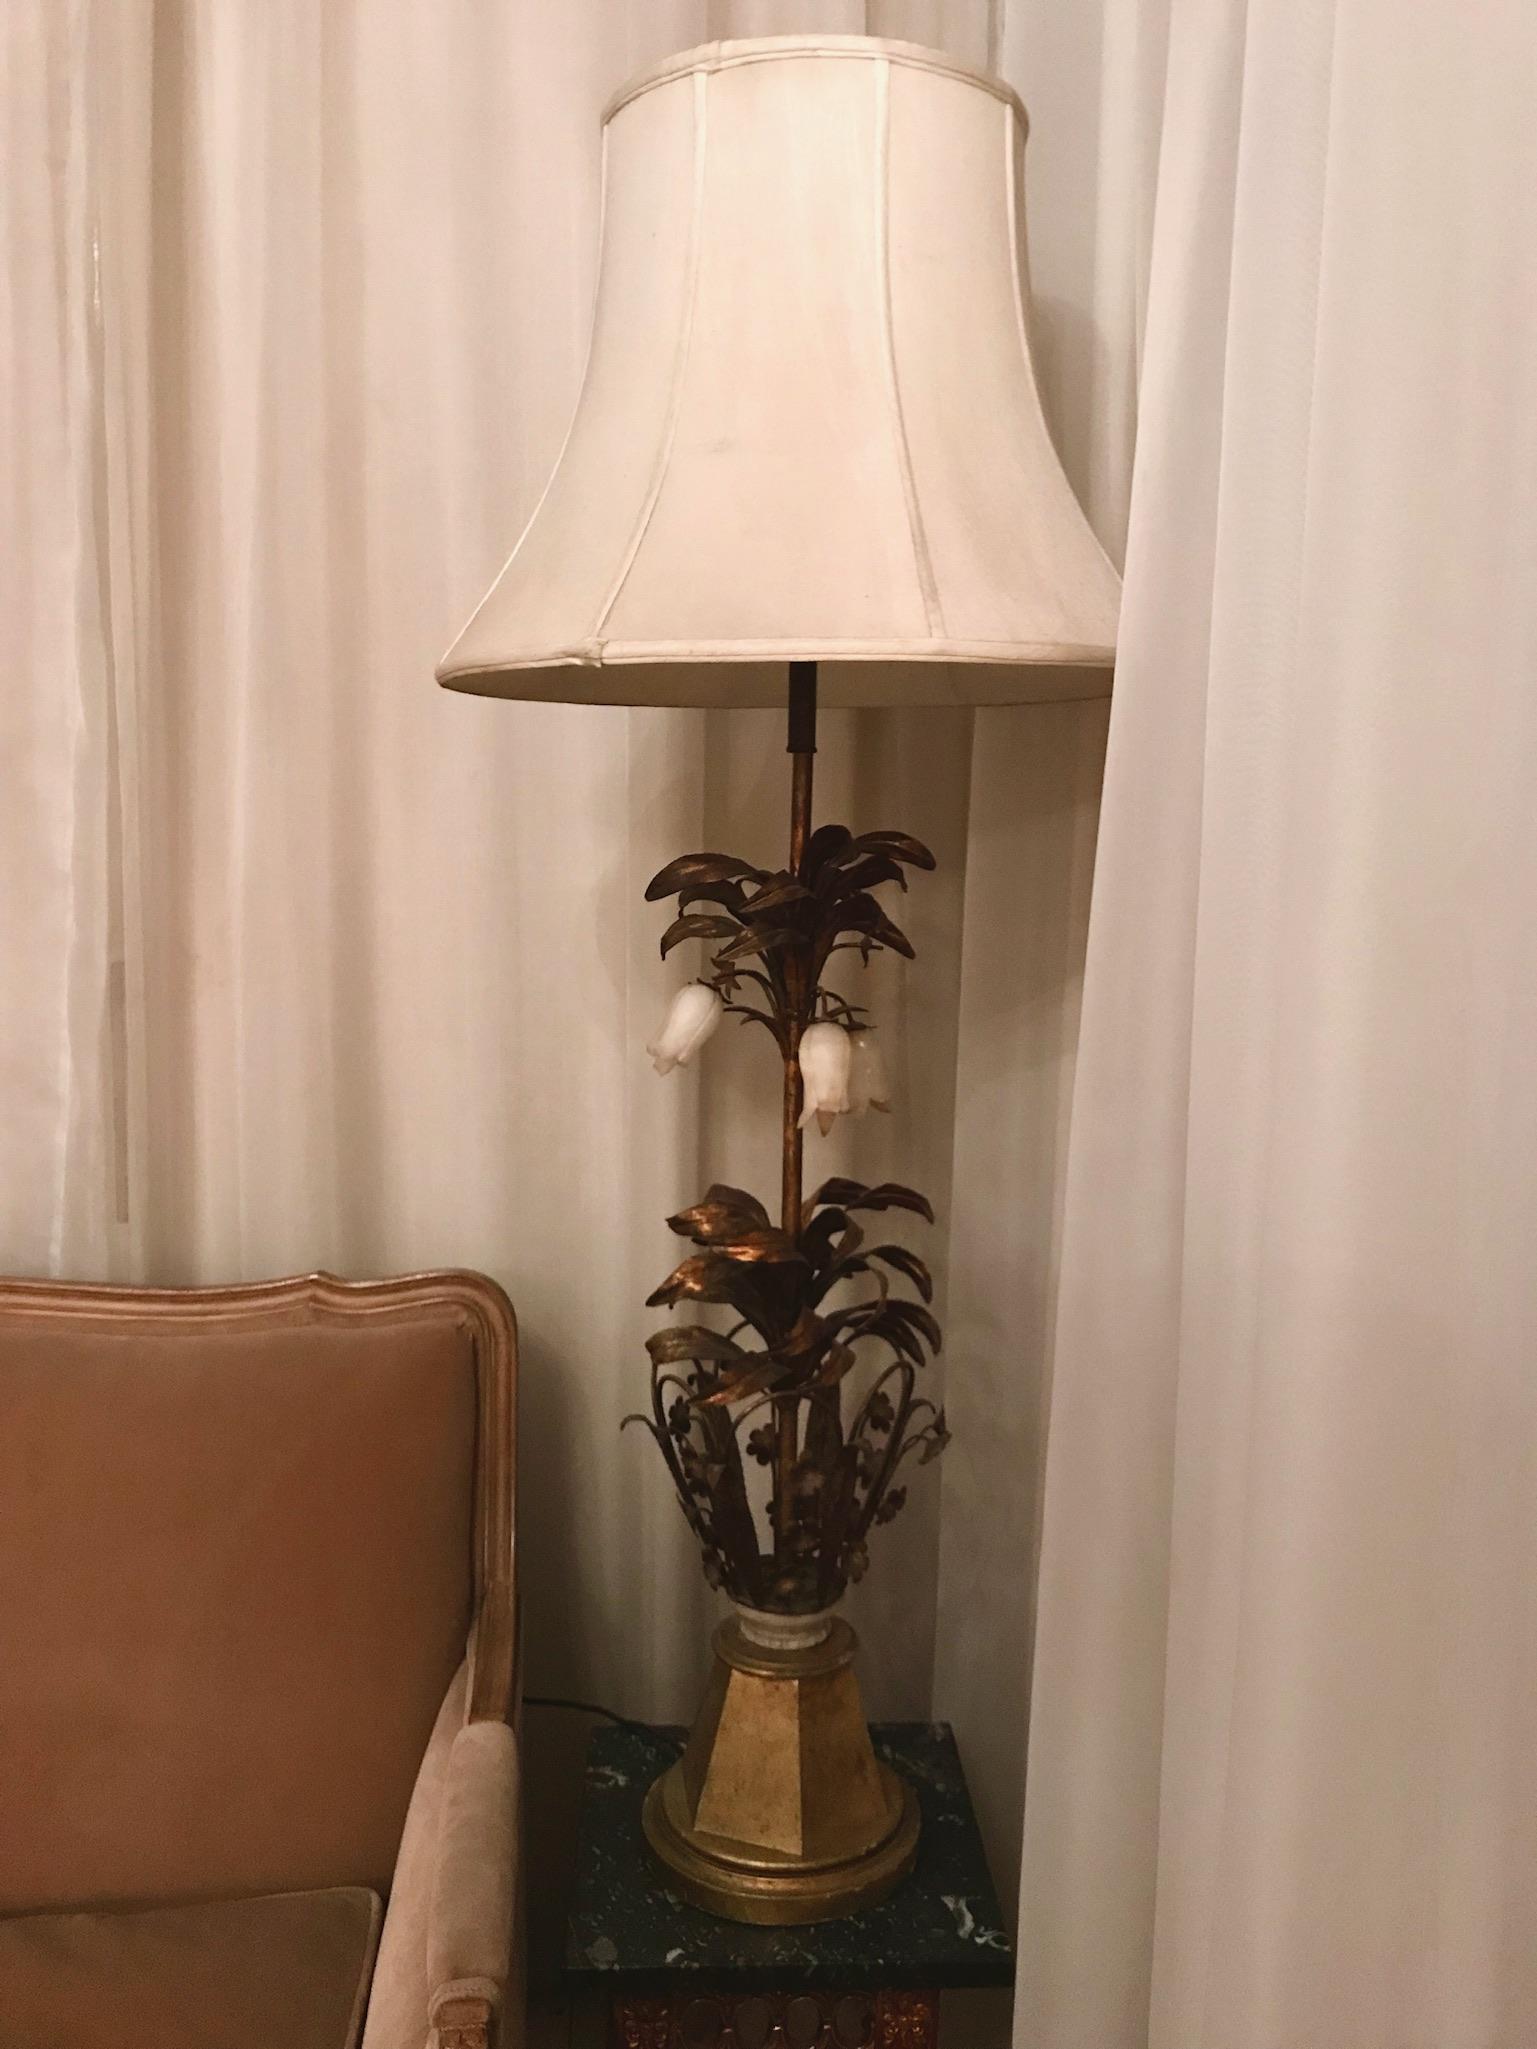 Dual Bulb Ornate tulip Lamp $90